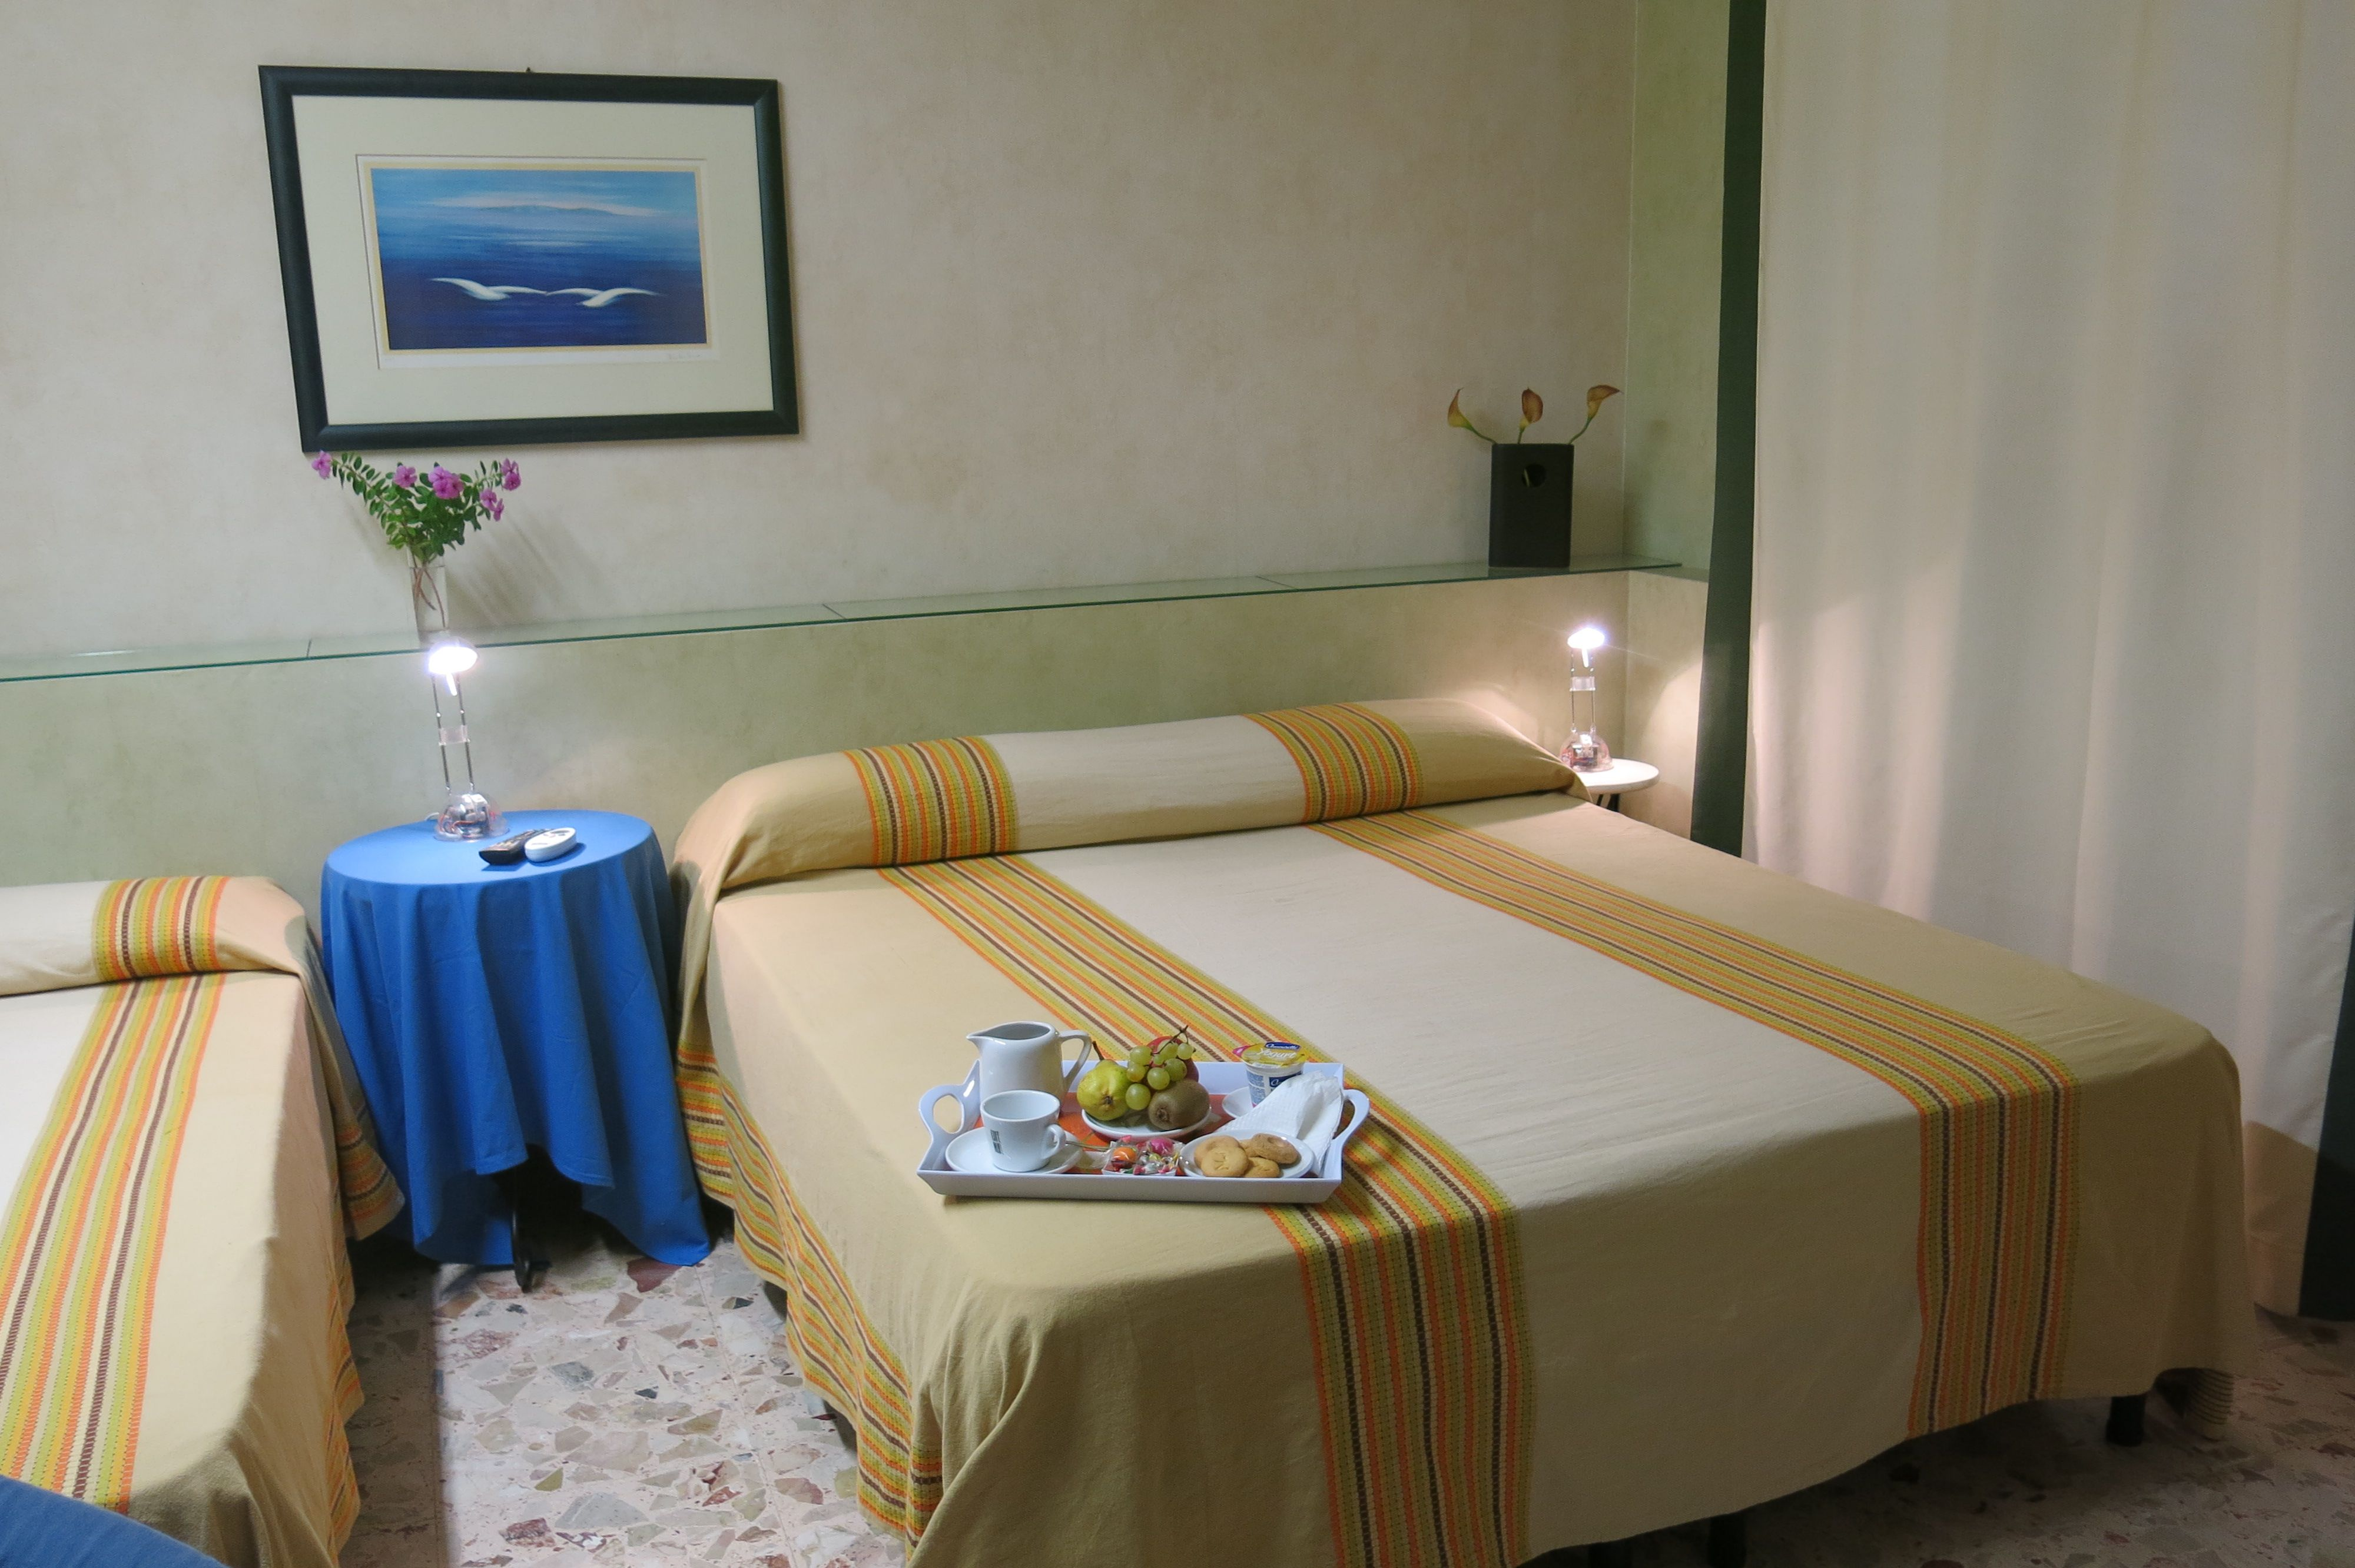 vacances in sicile mare nostrum bed and breakfast pozzallo chambres. Black Bedroom Furniture Sets. Home Design Ideas